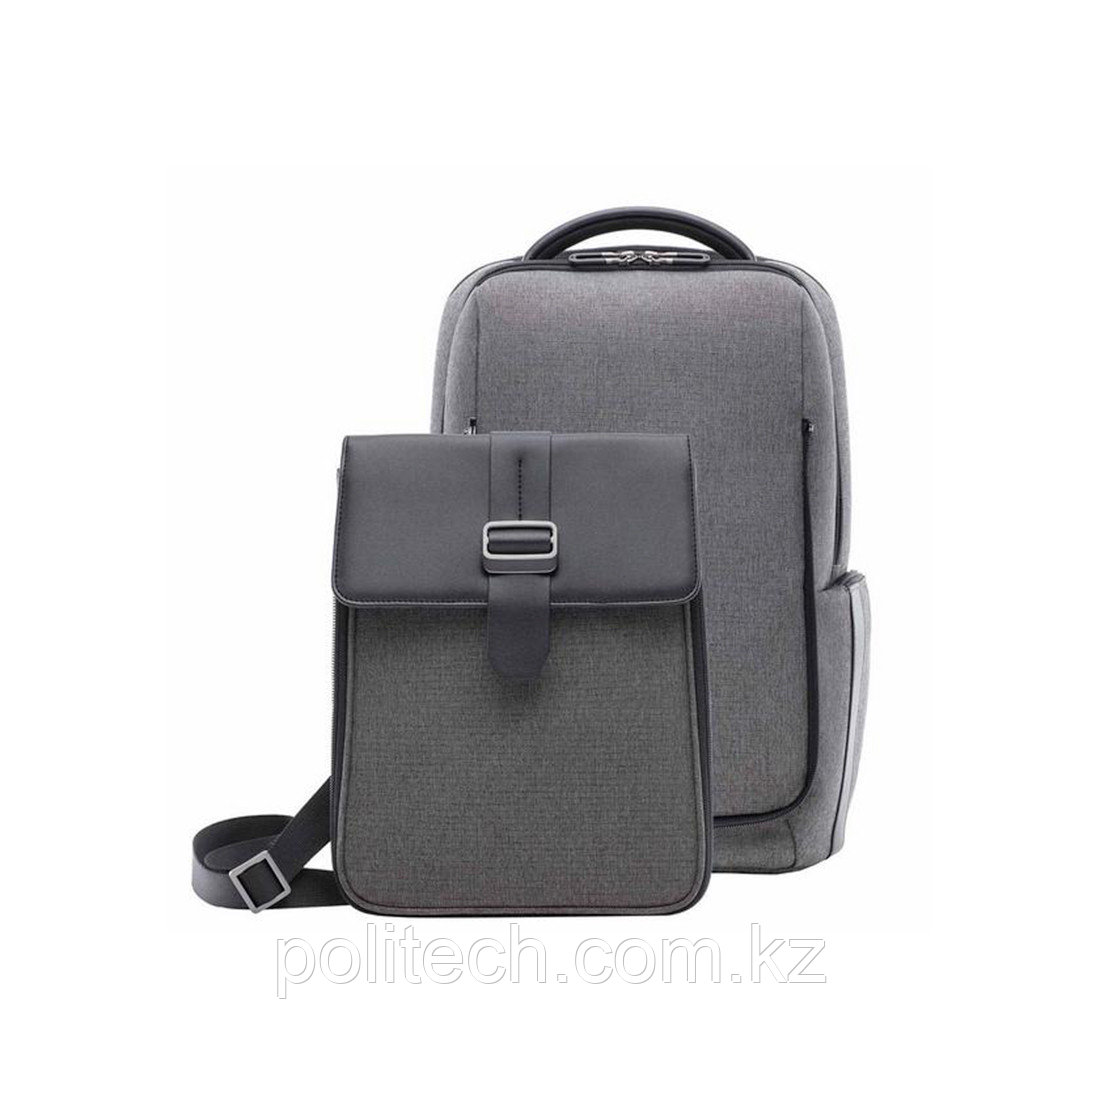 Рюкзак Mi Fashion Commuter Backpack Dark Grey Темно-Серый